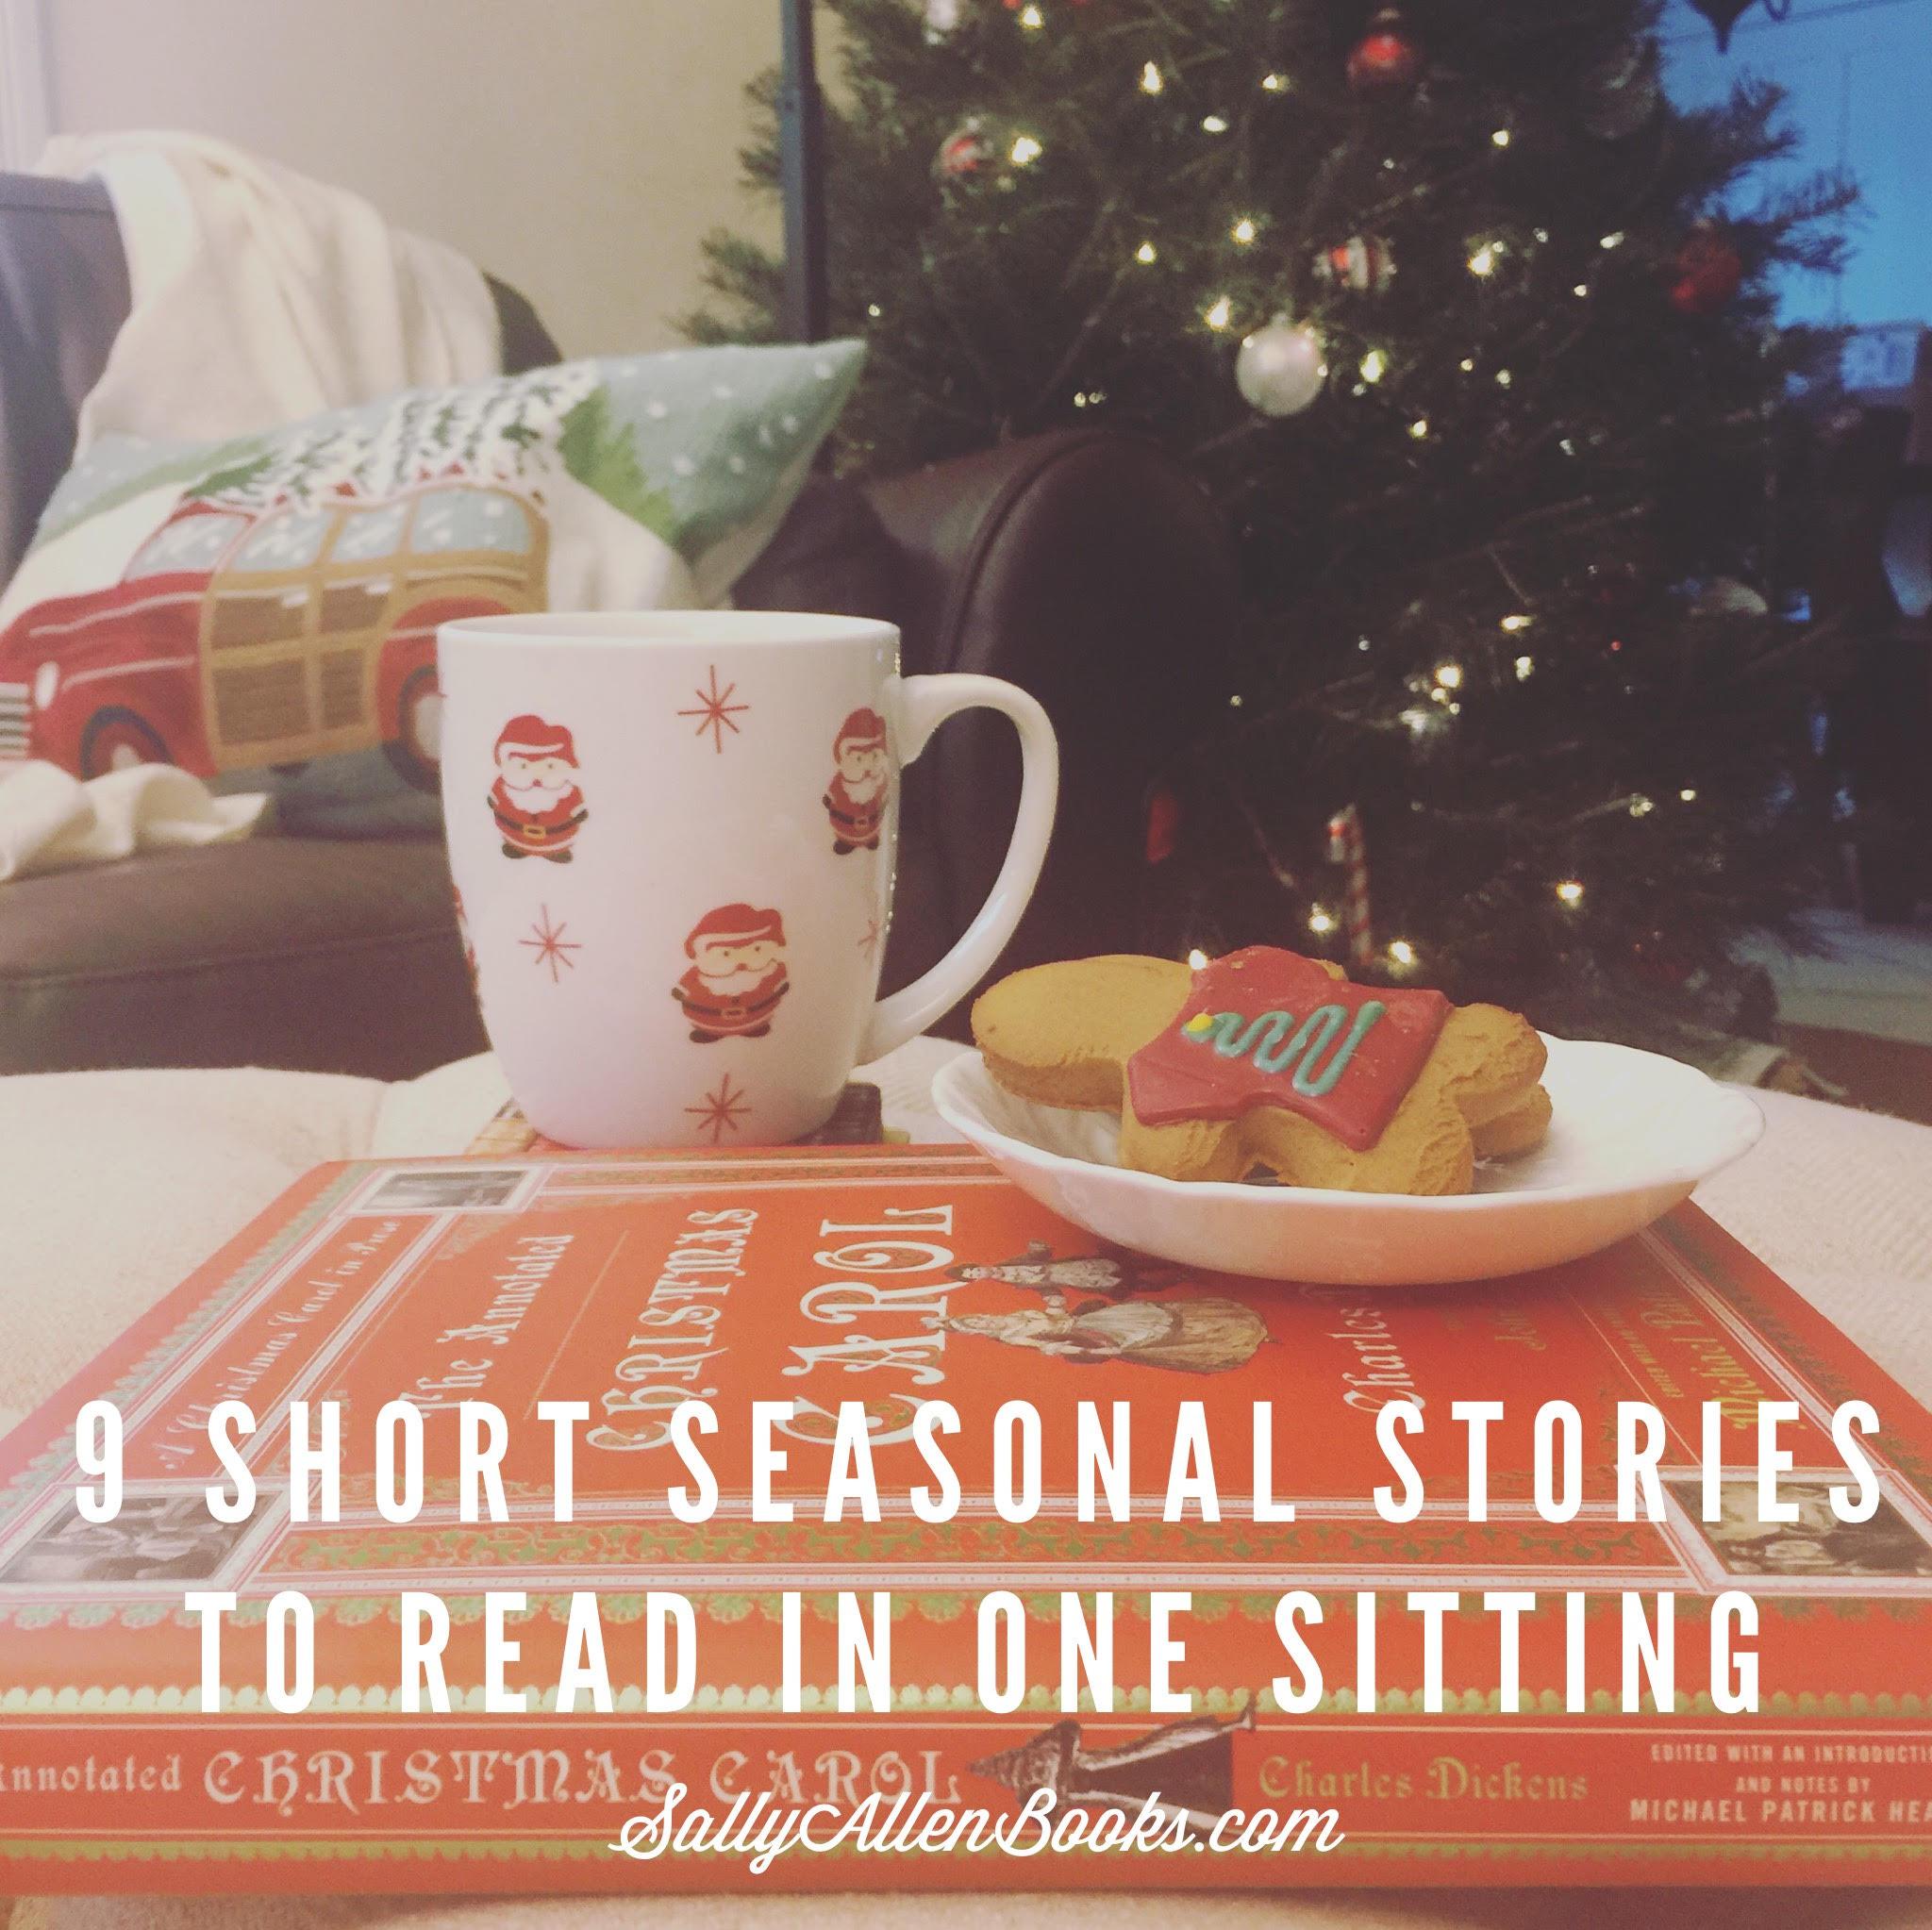 9Short Stories About True Love